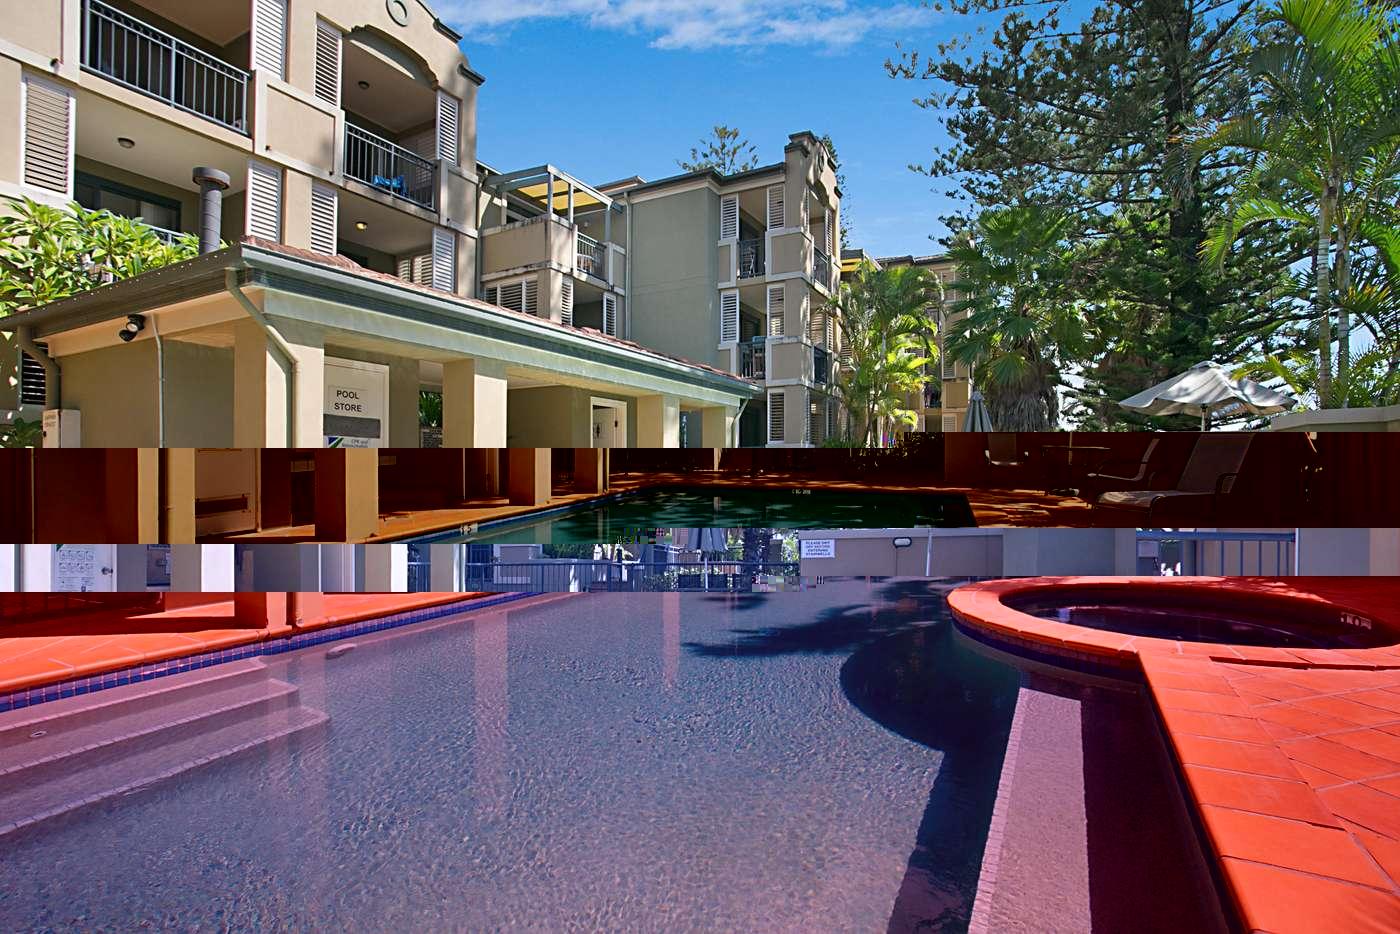 Main view of Homely apartment listing, 38-46 Petrel Avenue, Mermaid Beach QLD 4218